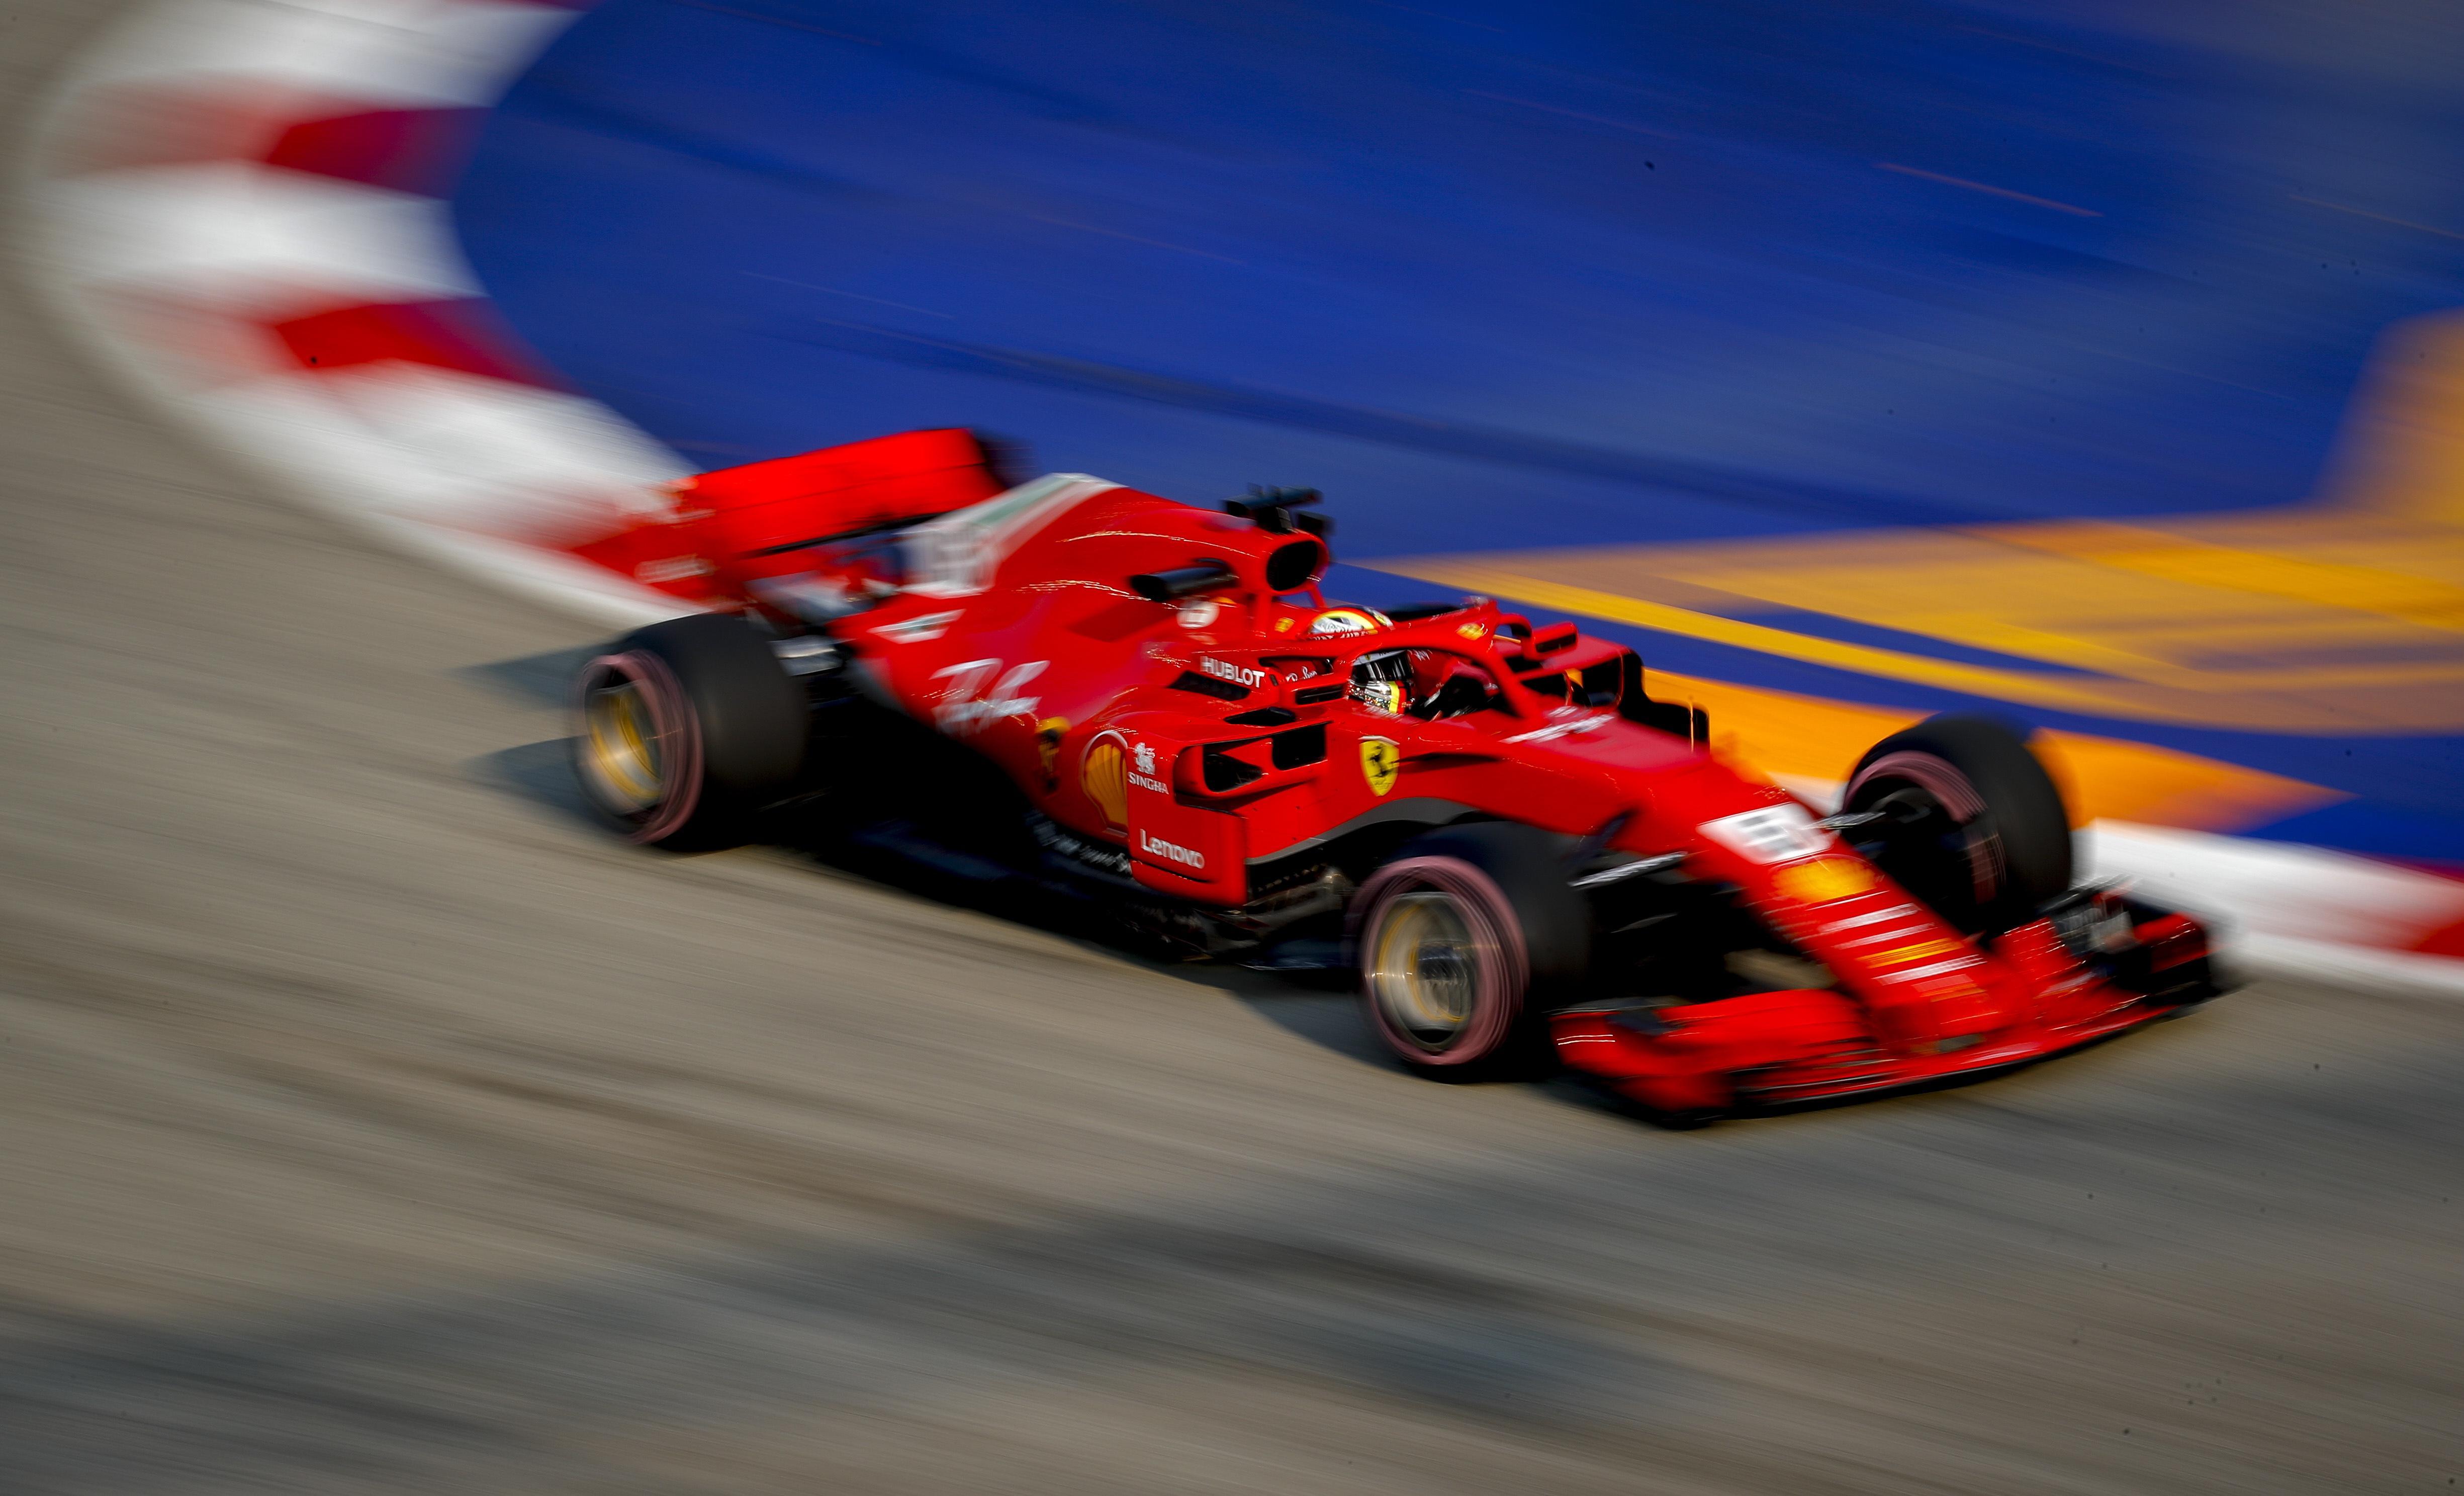 Sebastian Vettel crashed again during practice ahead of the Singapore GP